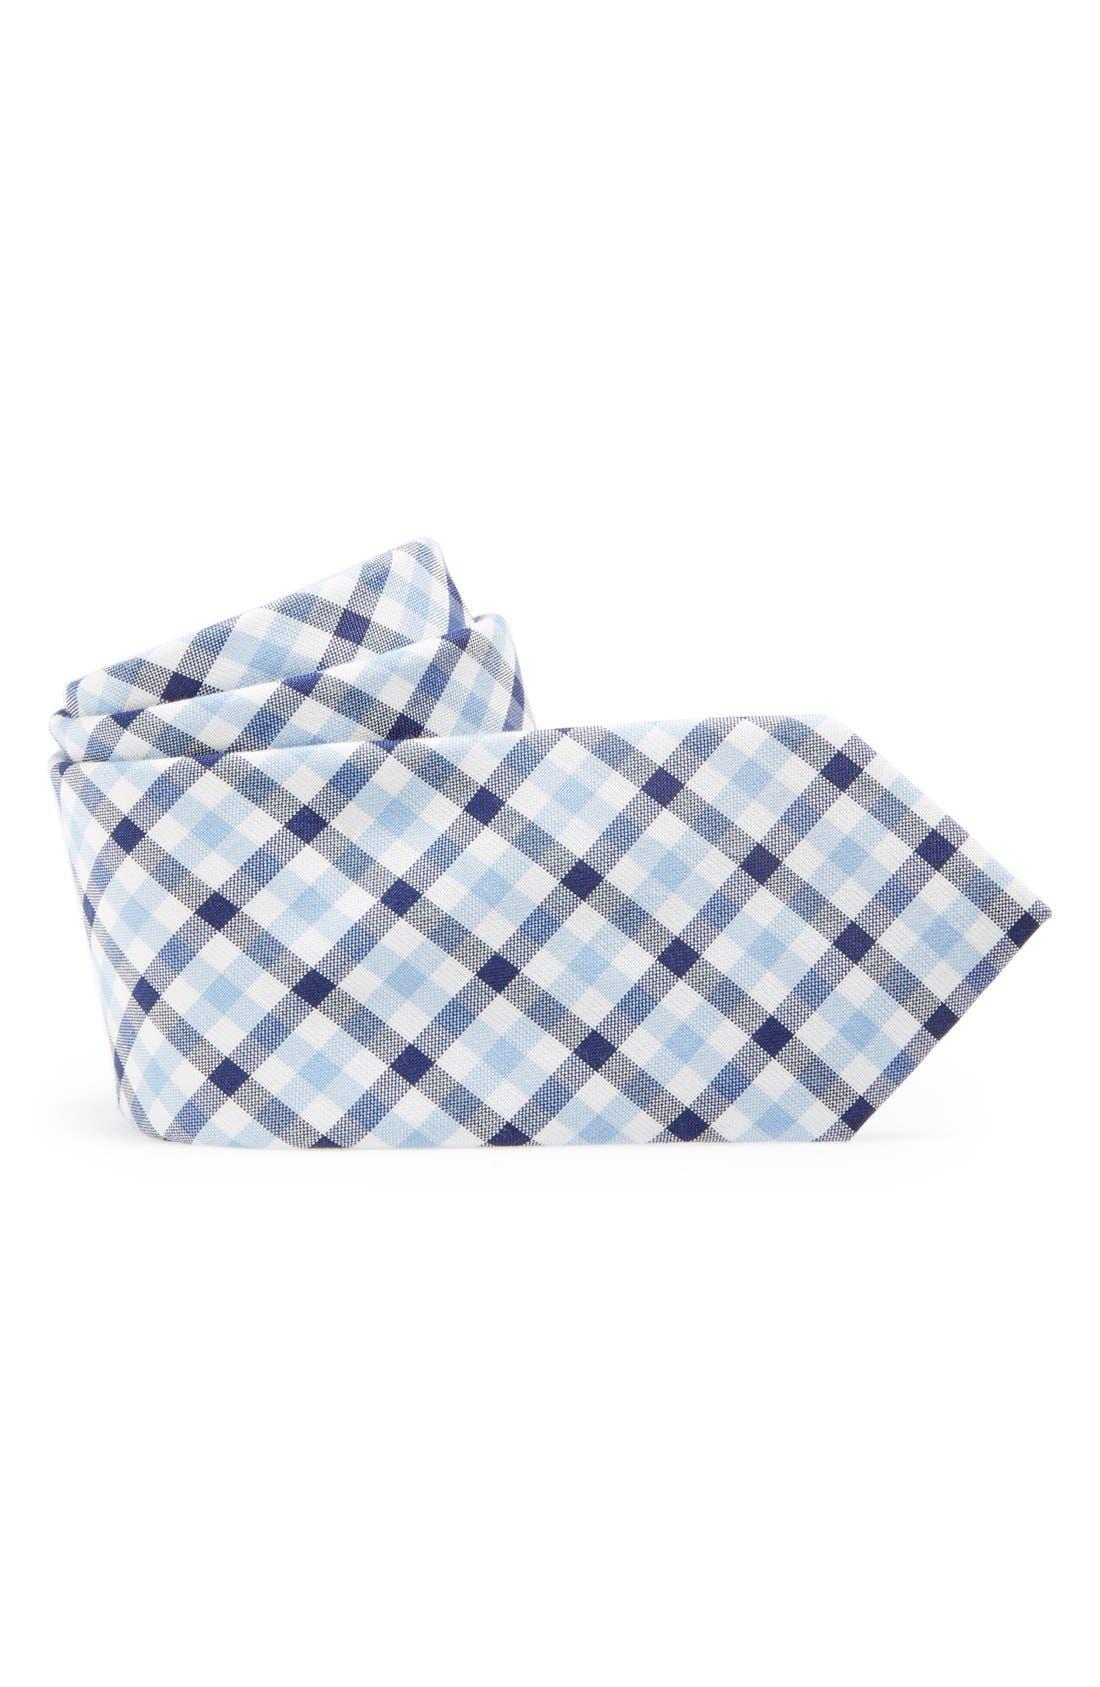 Alternate Image 1 Selected - Nordstrom Cotton Blend Tie (Big Boys)